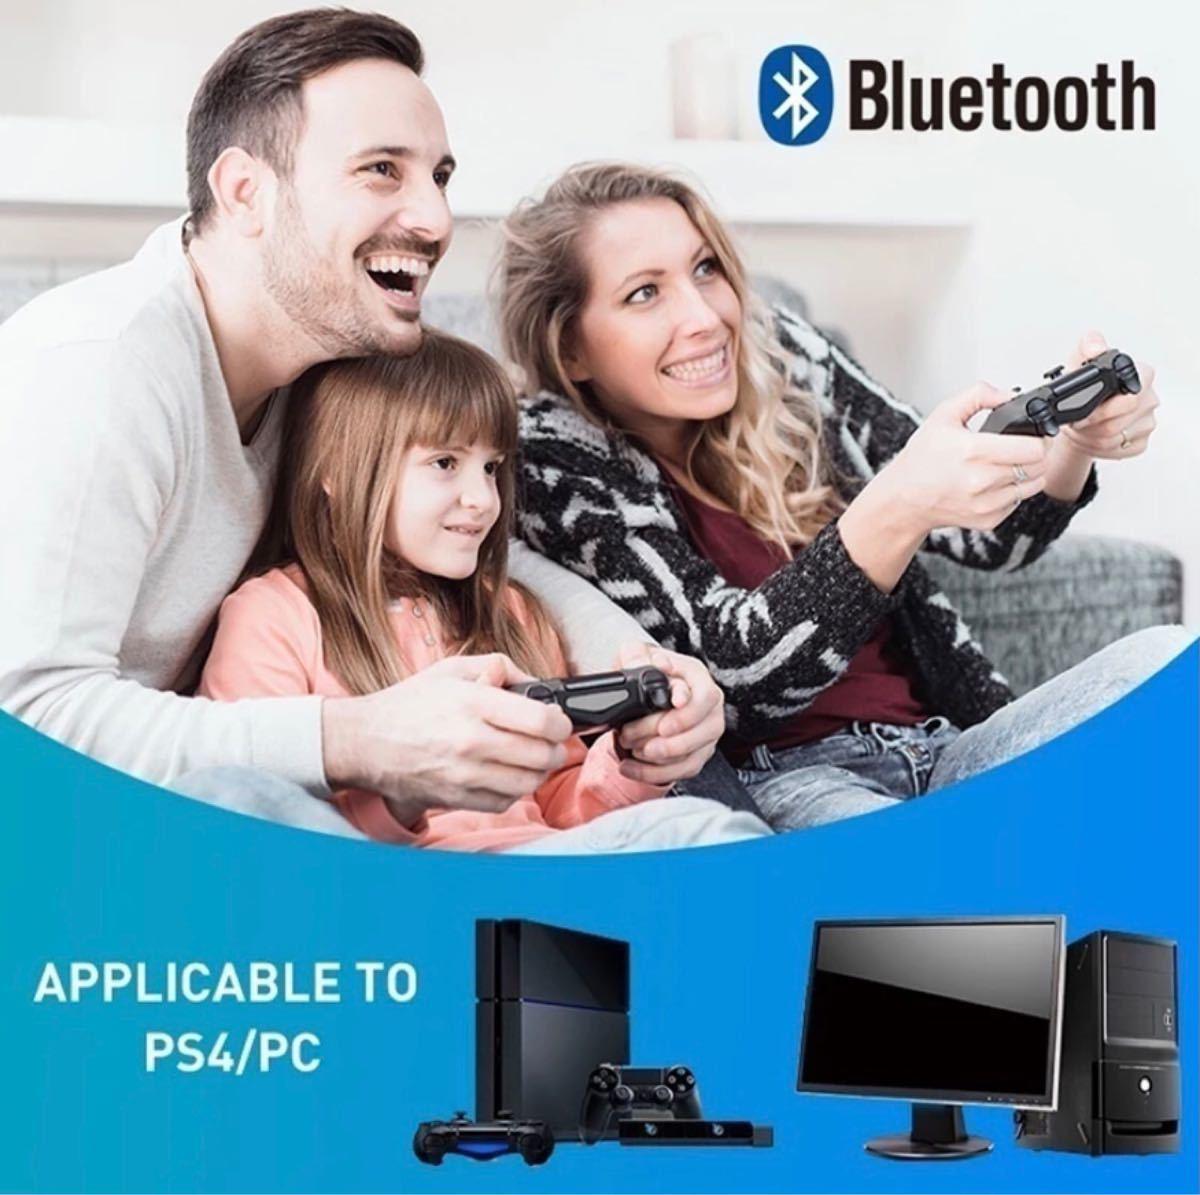 PS4 PS4コントローラー ワイヤレスコントローラー プレイステーション4 互換品 DUALSHOCK4